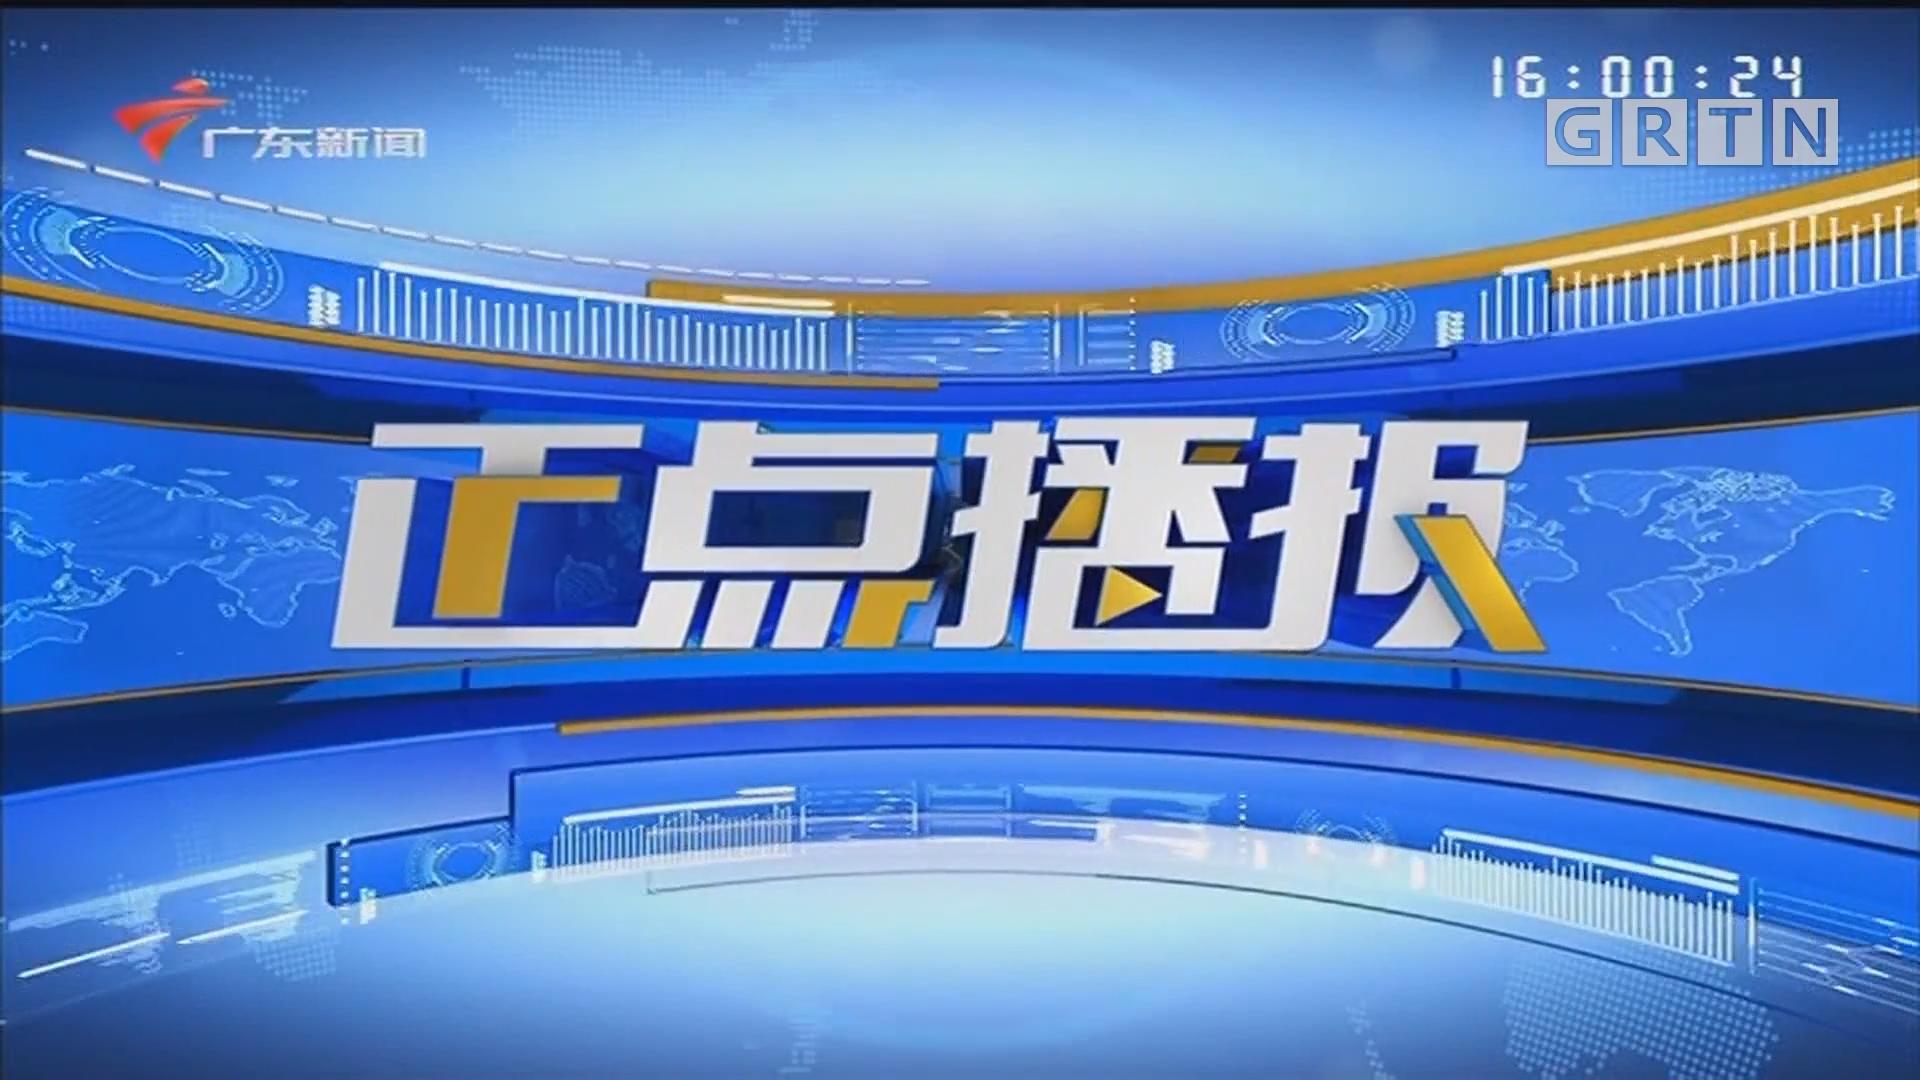 [HD][2020-02-15-16:00]正点播报:广东省政府举行疫情防控发布会